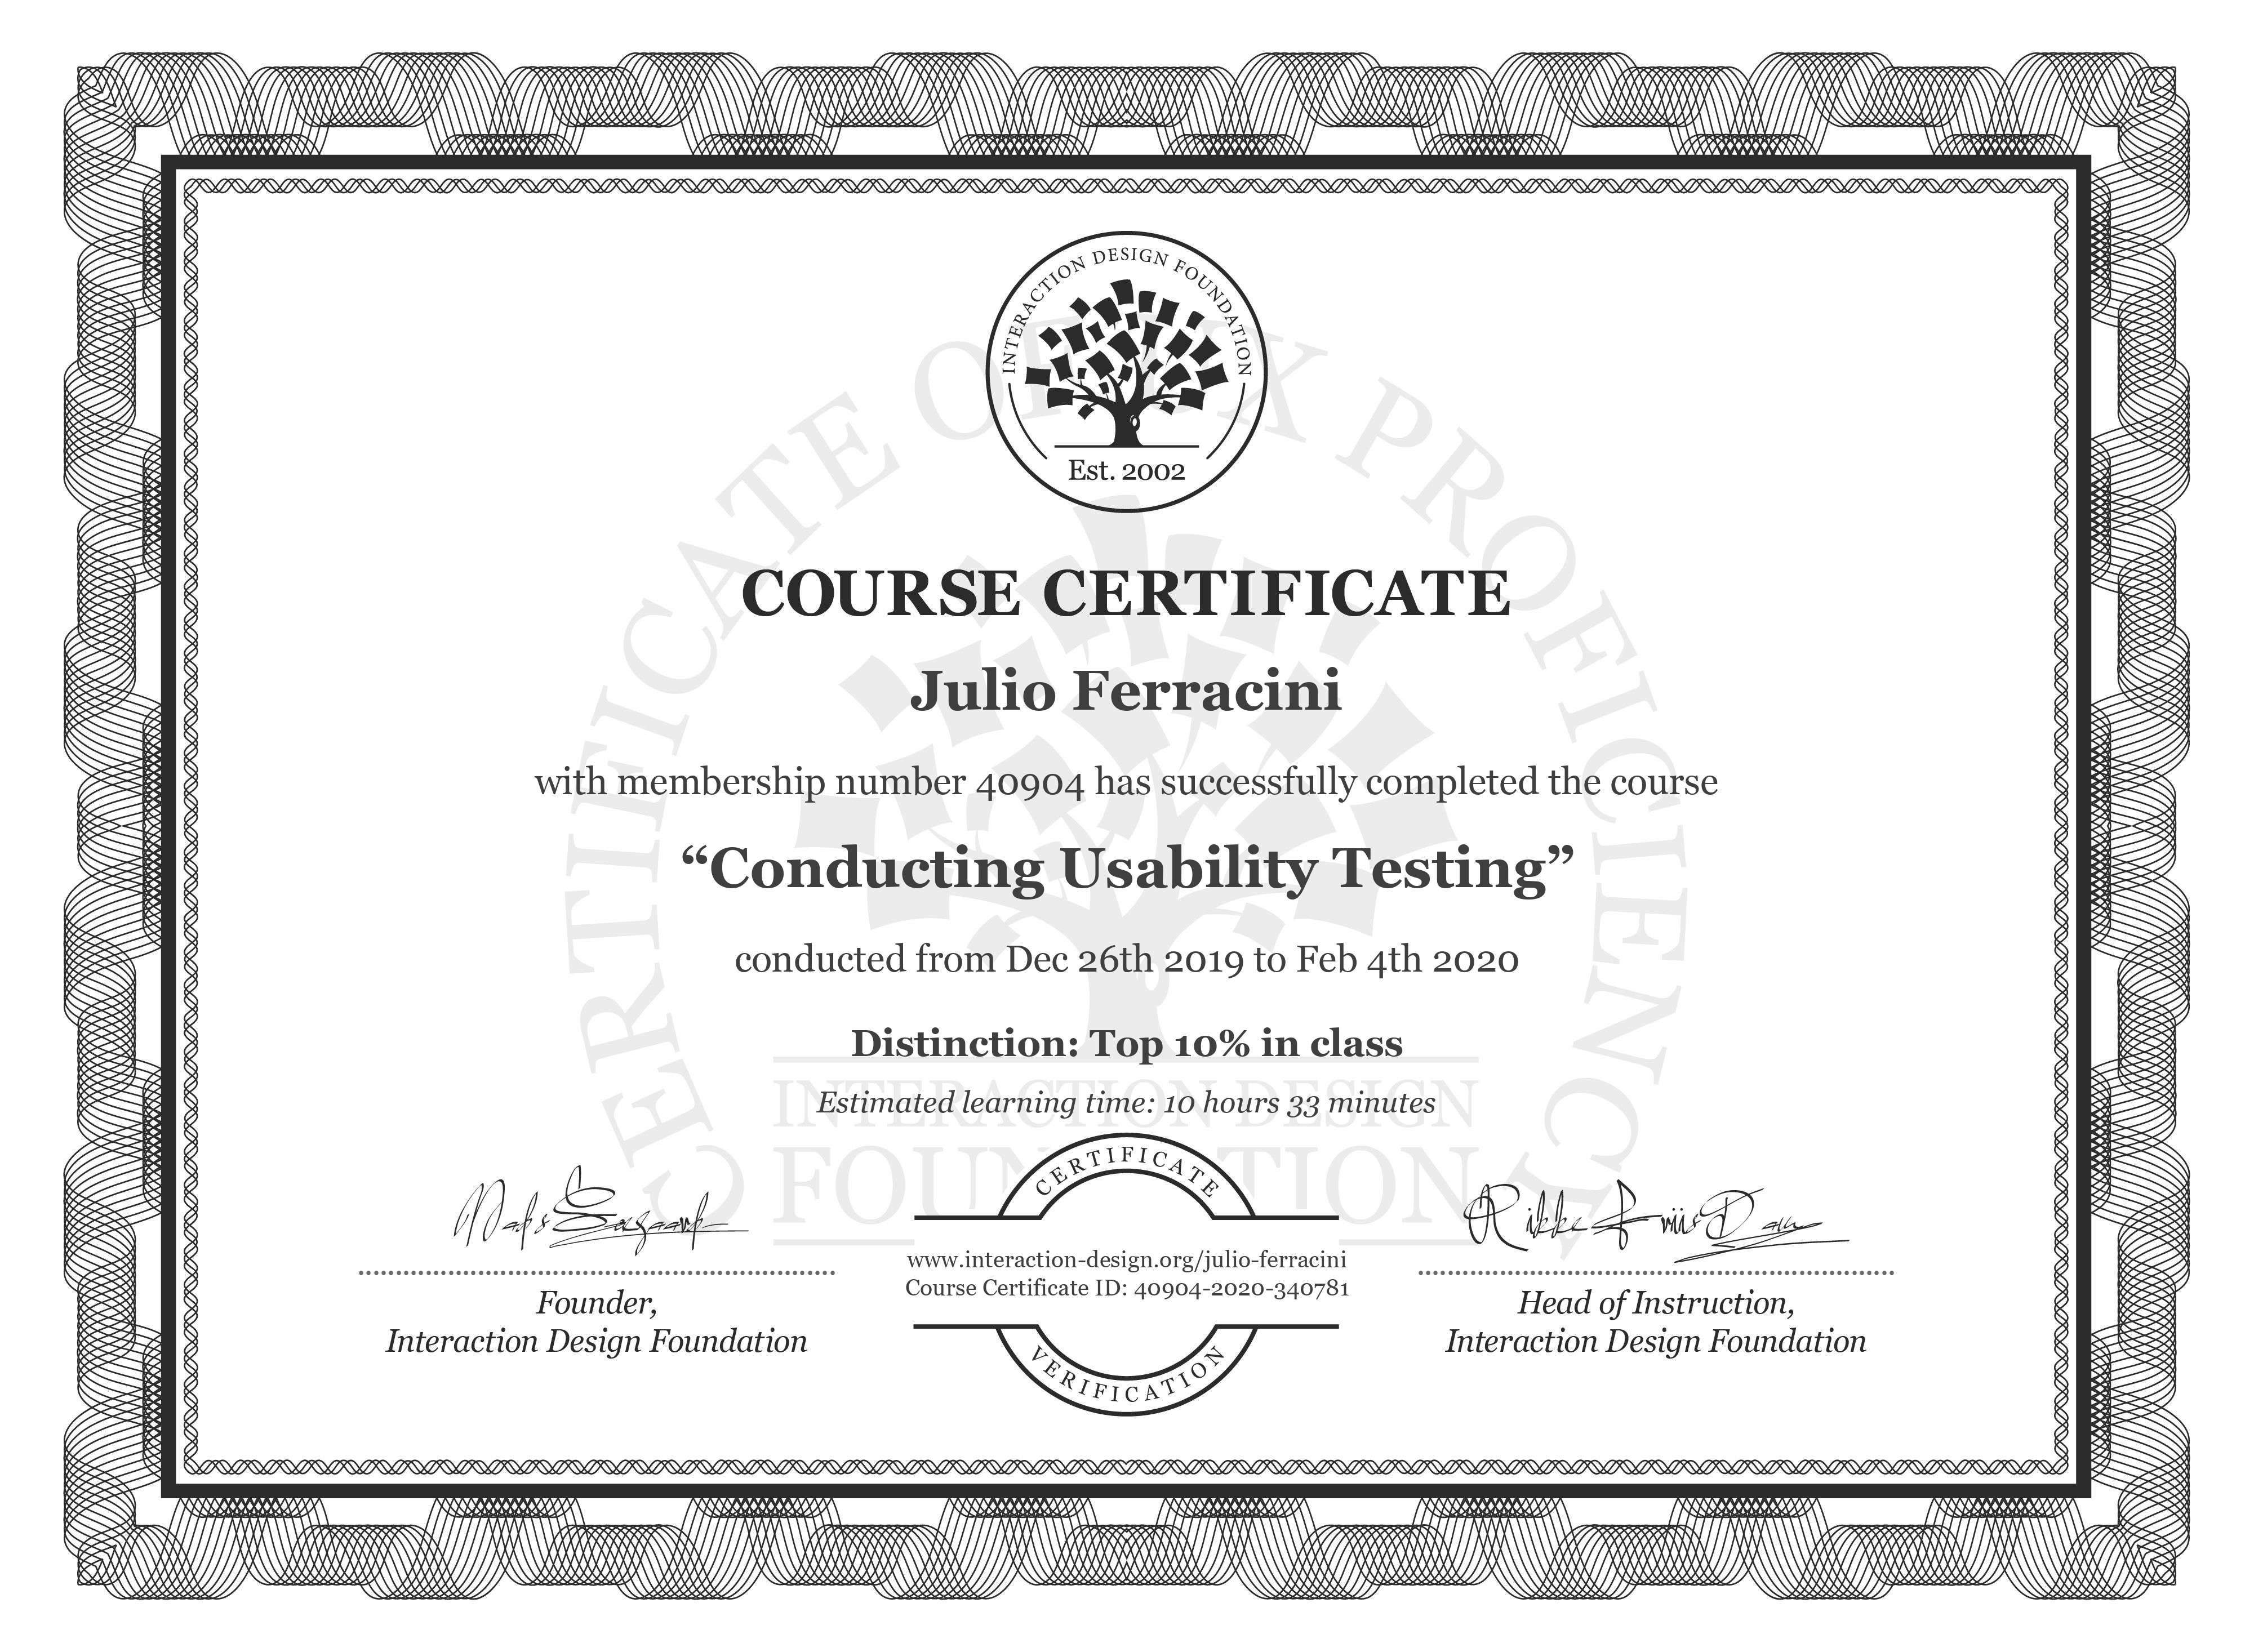 Julio Ferracini's Course Certificate: Conducting Usability Testing